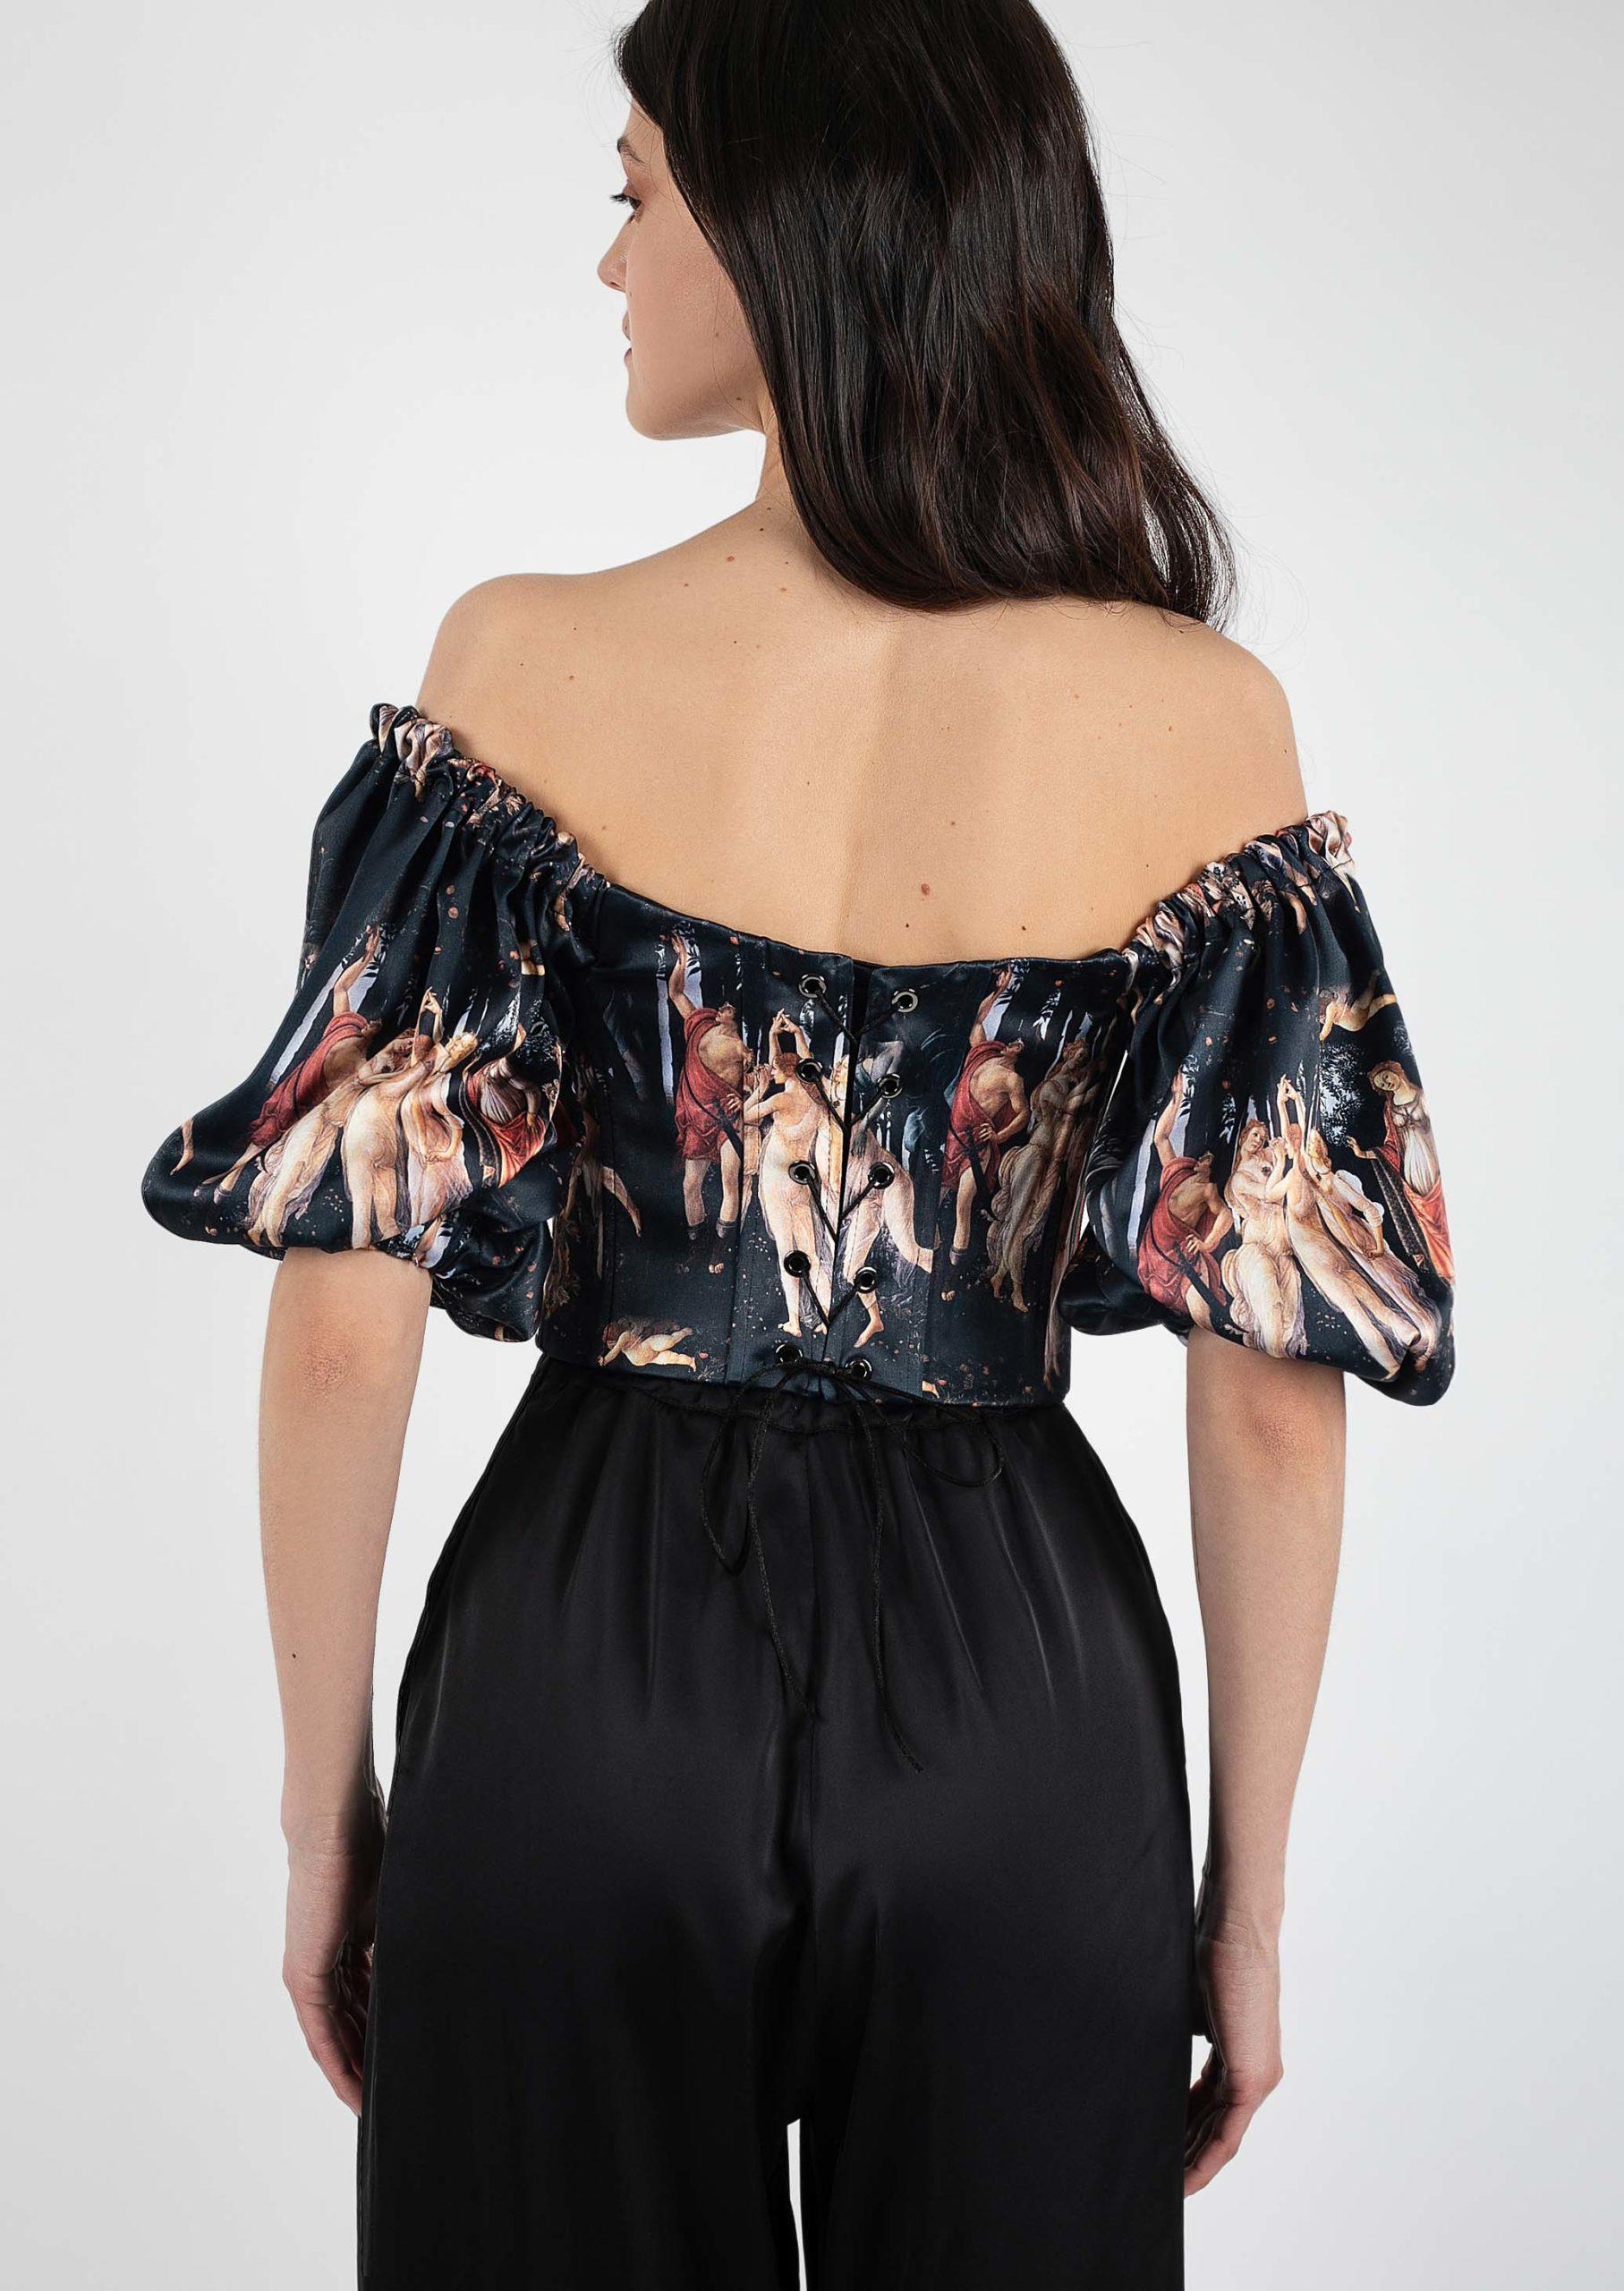 primavera historical corset